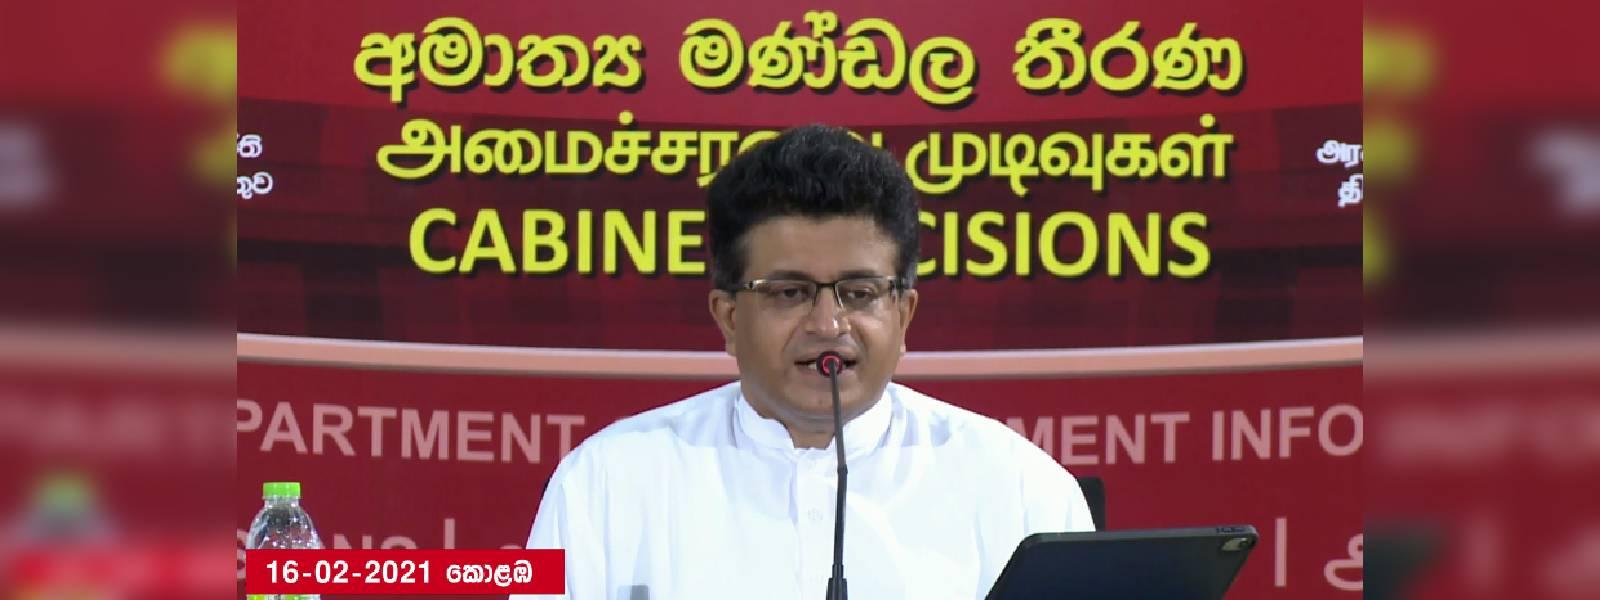 People will NOT allow BJP to enter Sri Lanka: Minister Gammanpila